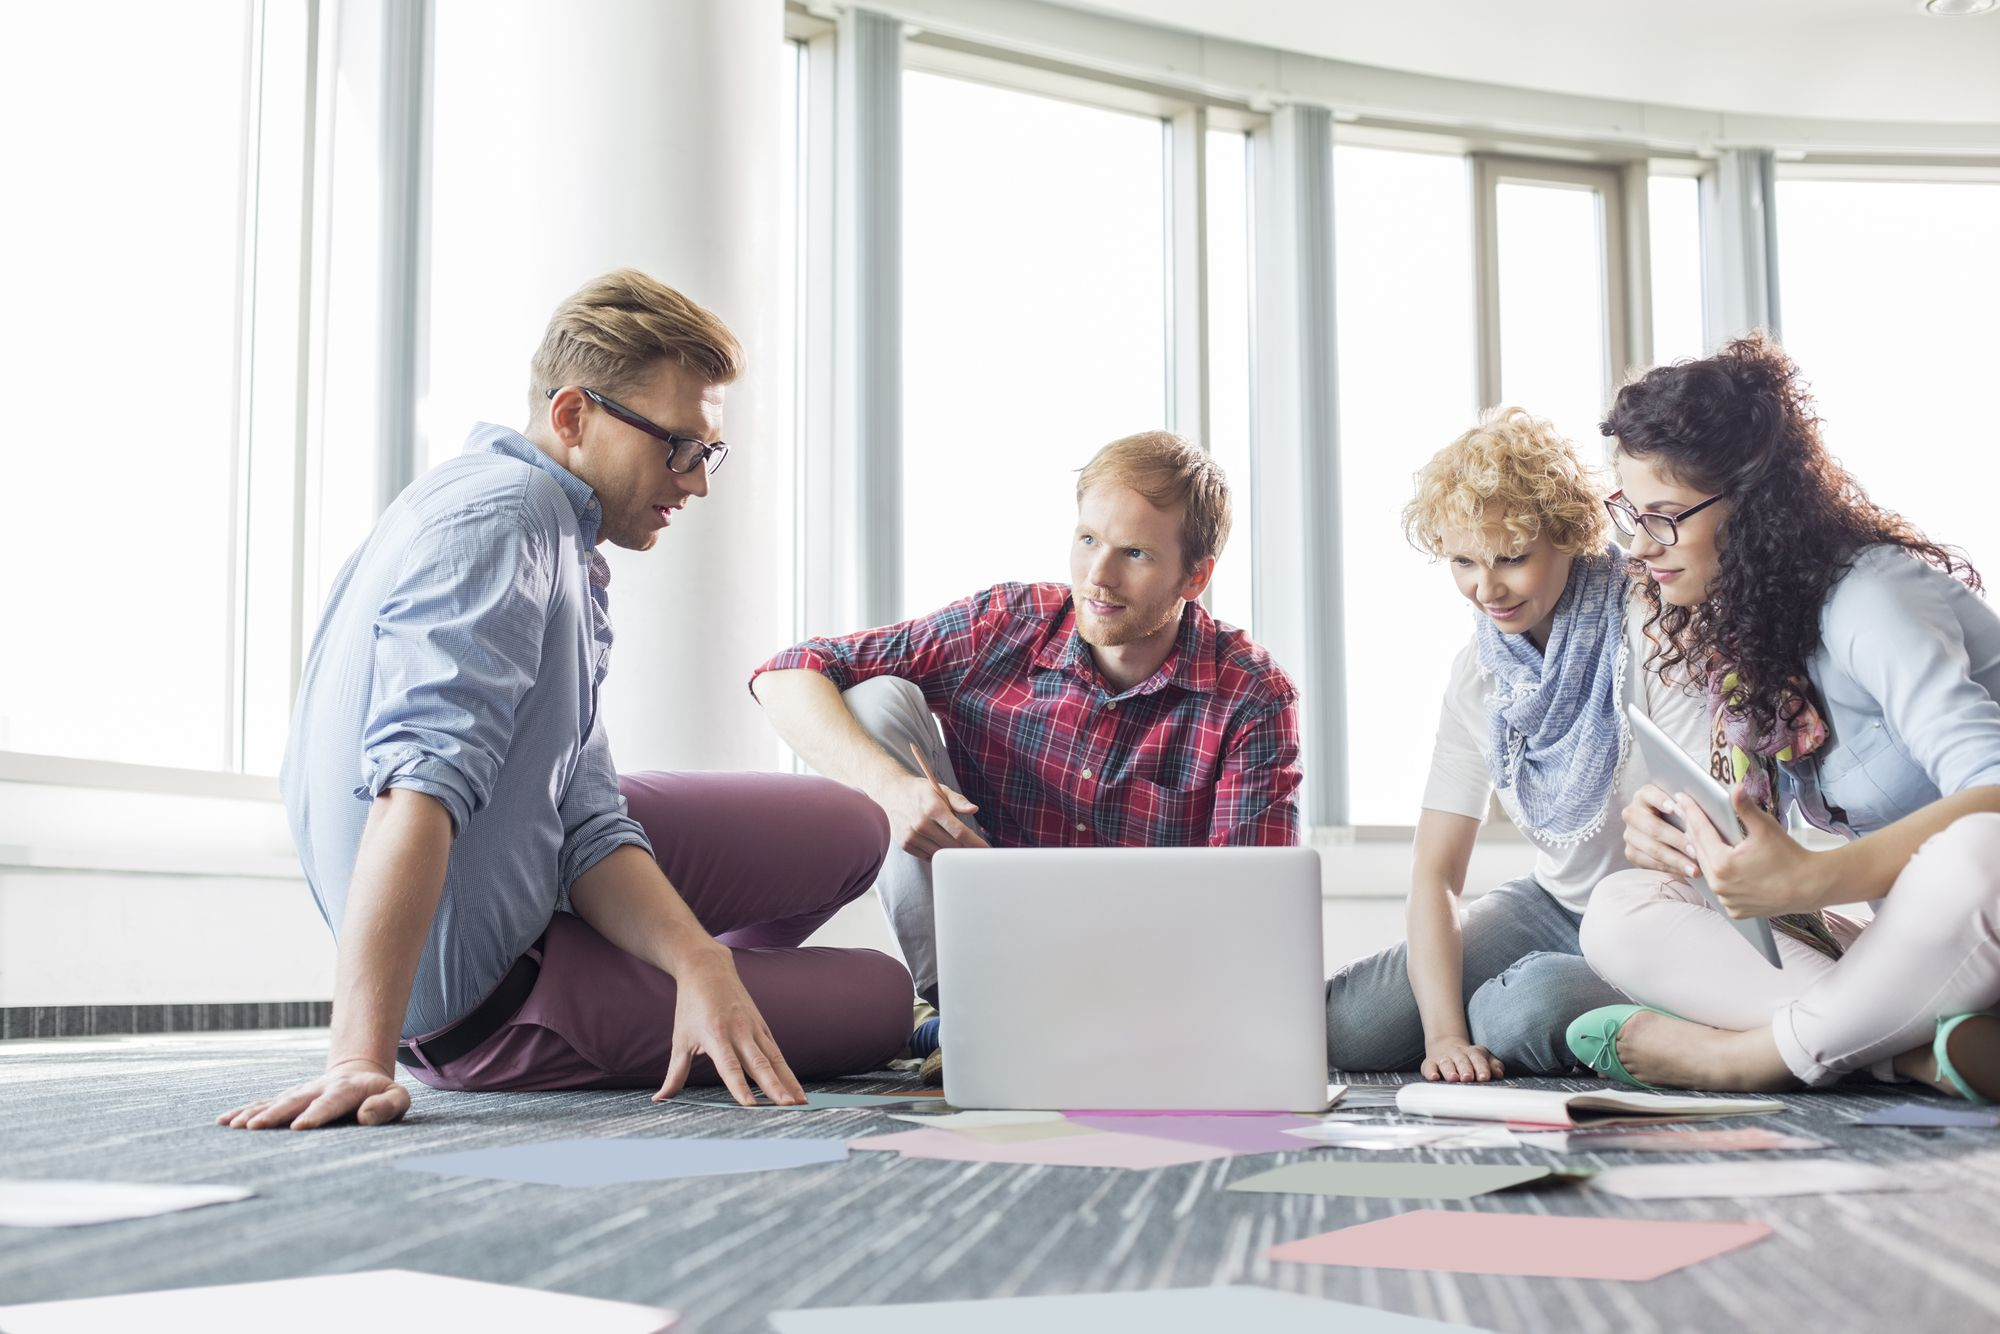 Entenda agora como estruturar o fluxo de trabalho na agência